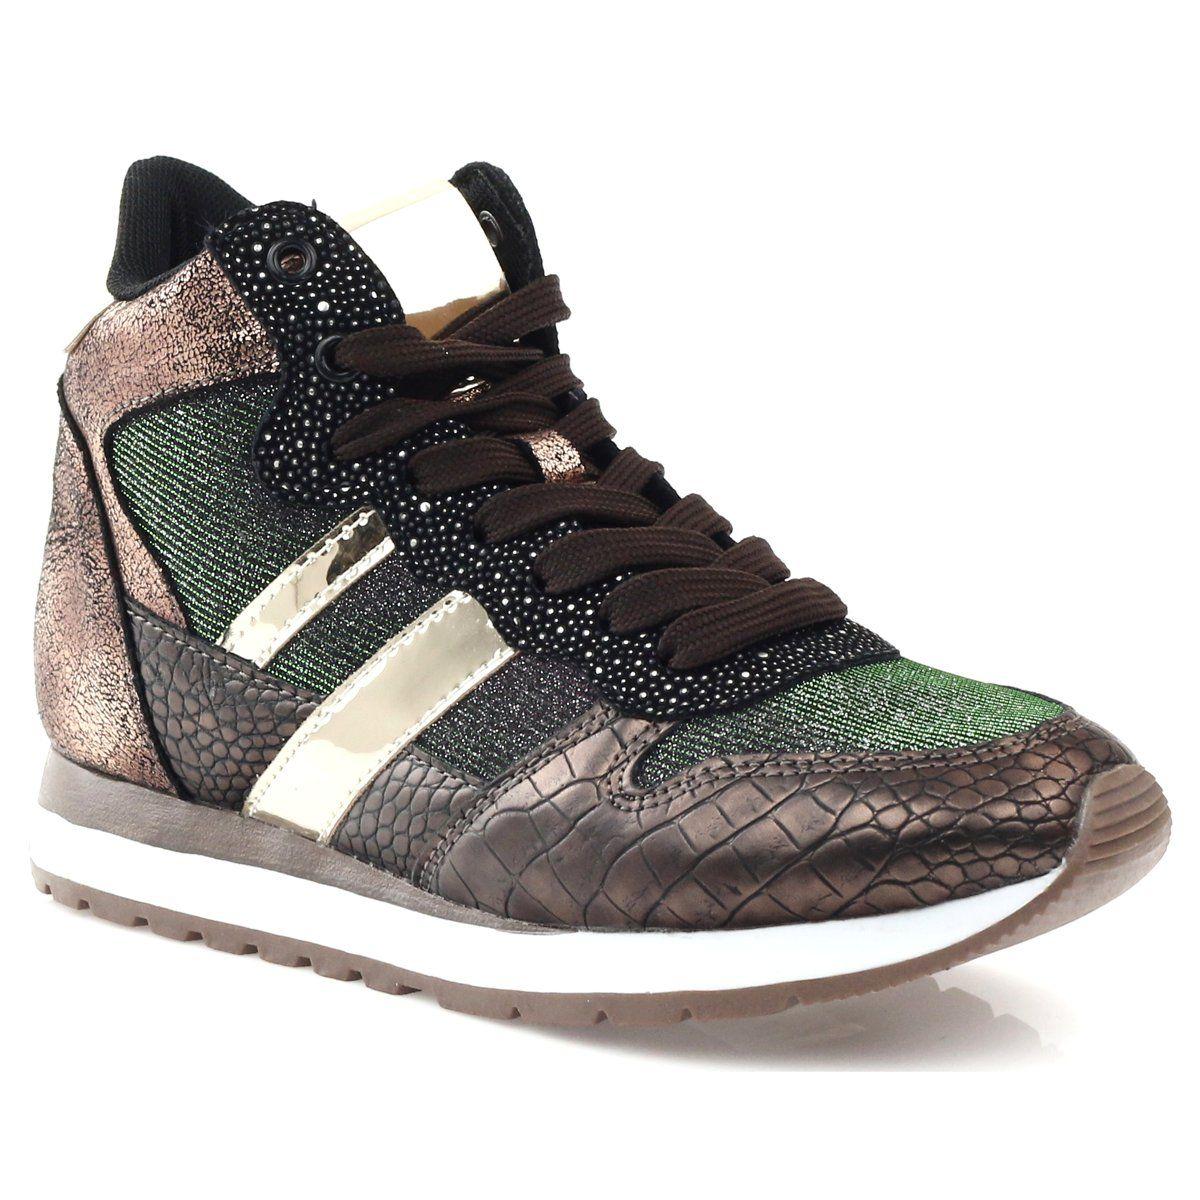 Mcarthur Buty Sportowe Bezowy Miedziane Wielokolorowe Zloty Sports Shoes Sports Footwear Shoes